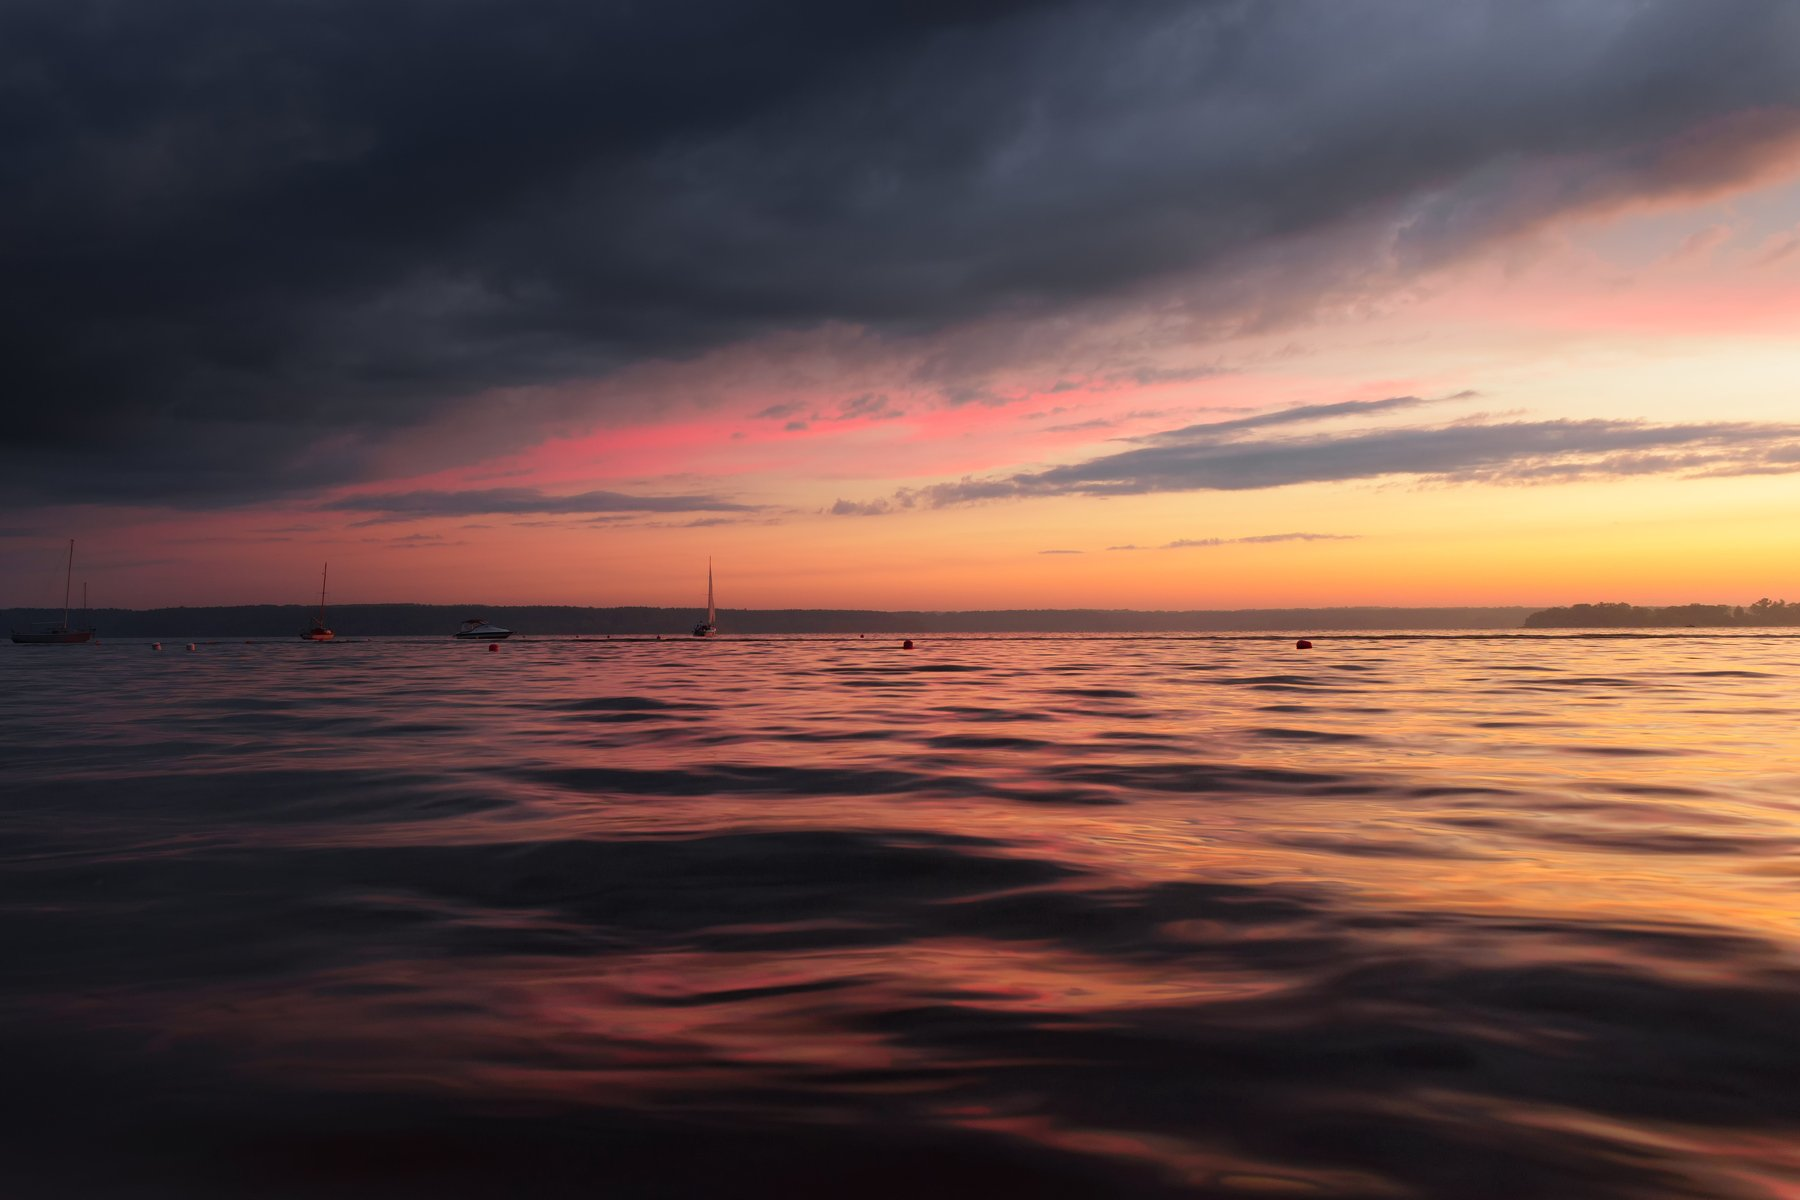 дождь вода гроза море лето солнце закат лодки яхты, Евгений Цап